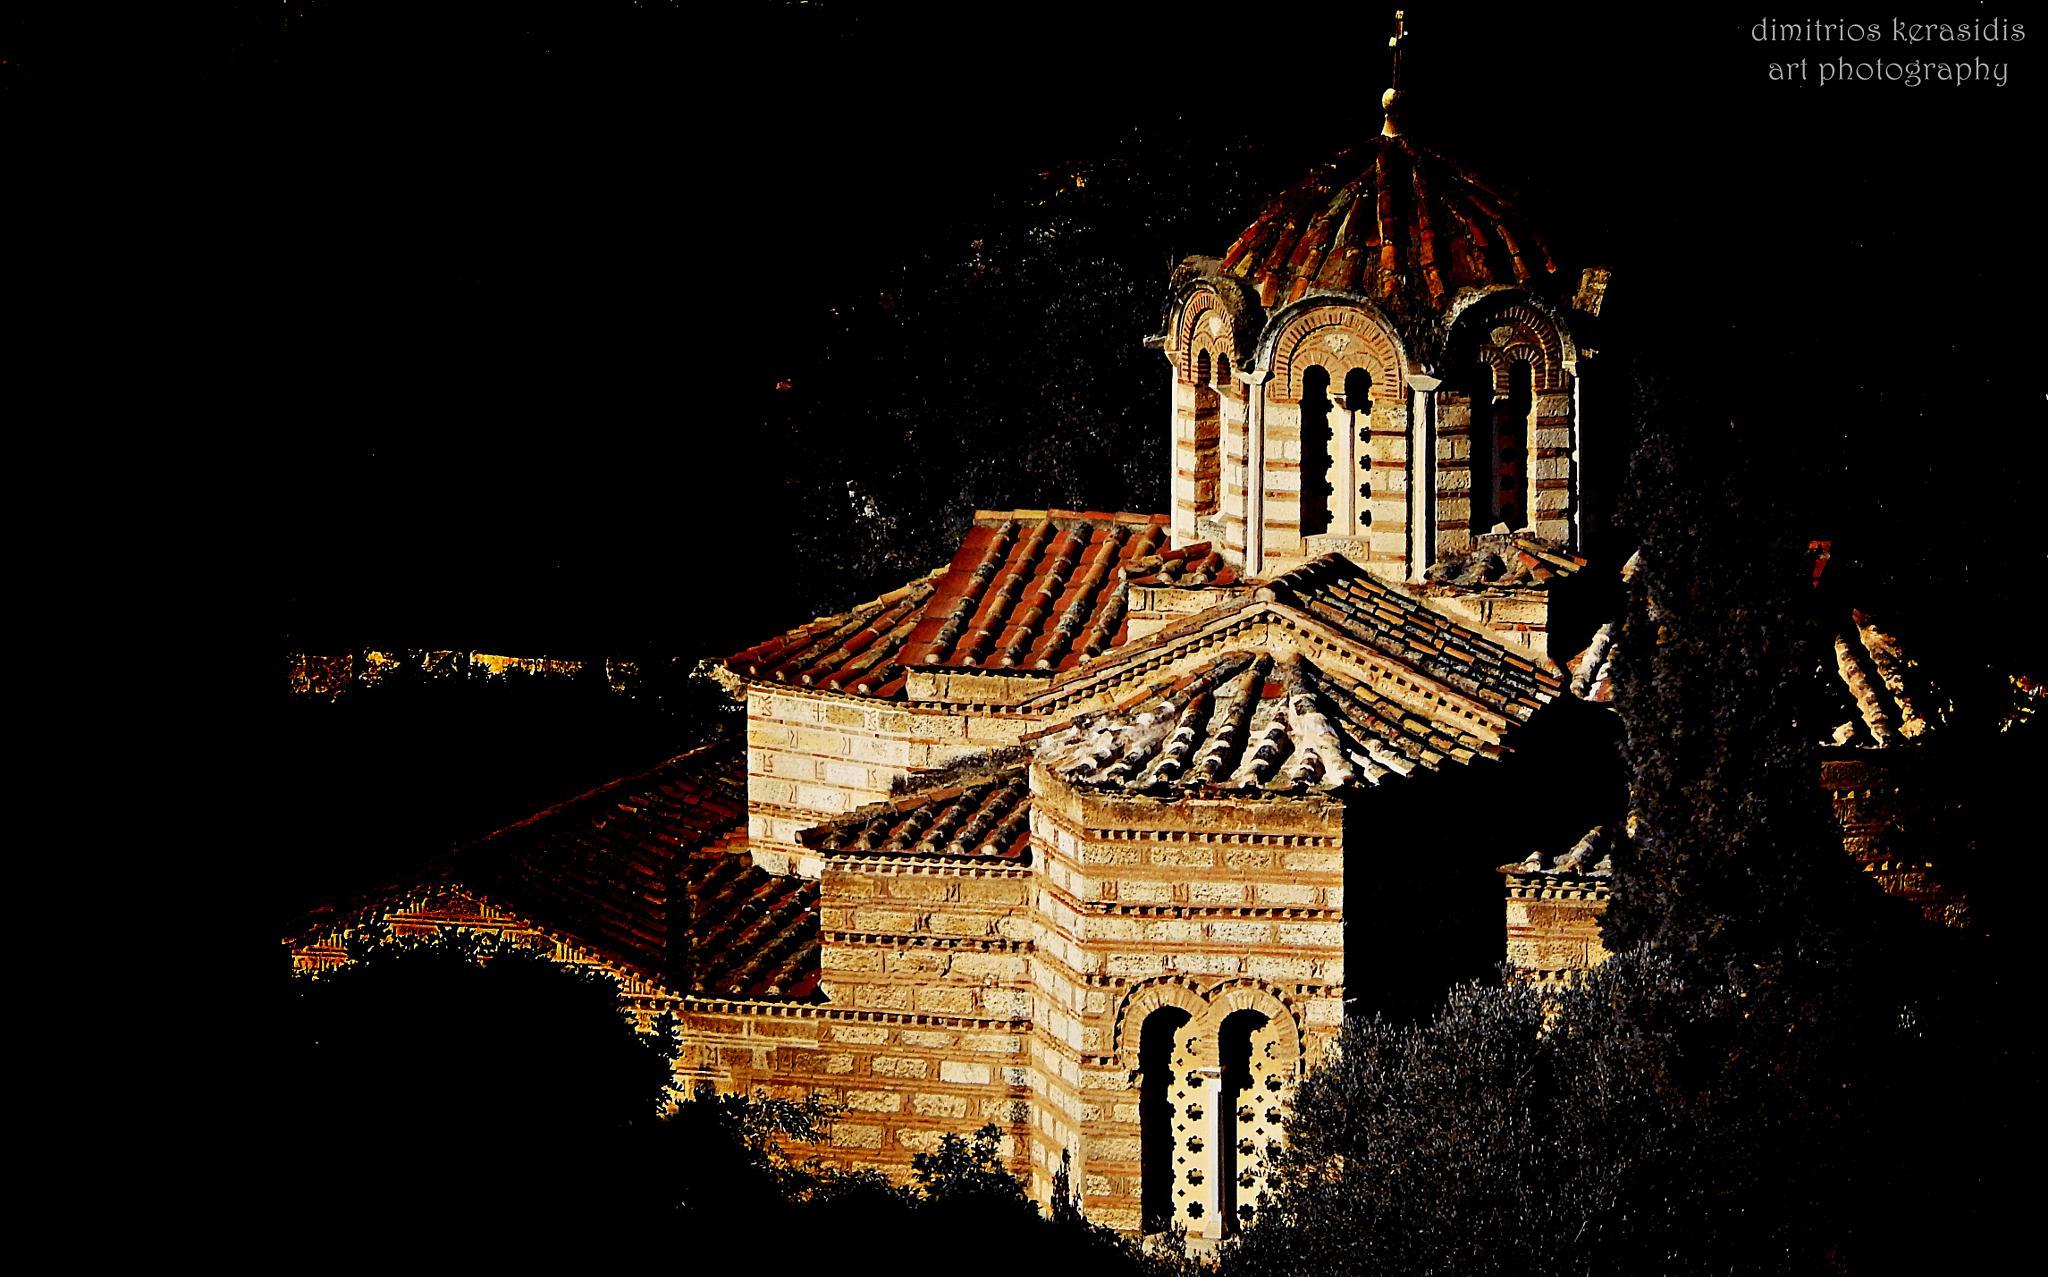 Church of the Holy Apostles & Temple of Hephaestus by kerasidis.dimitris